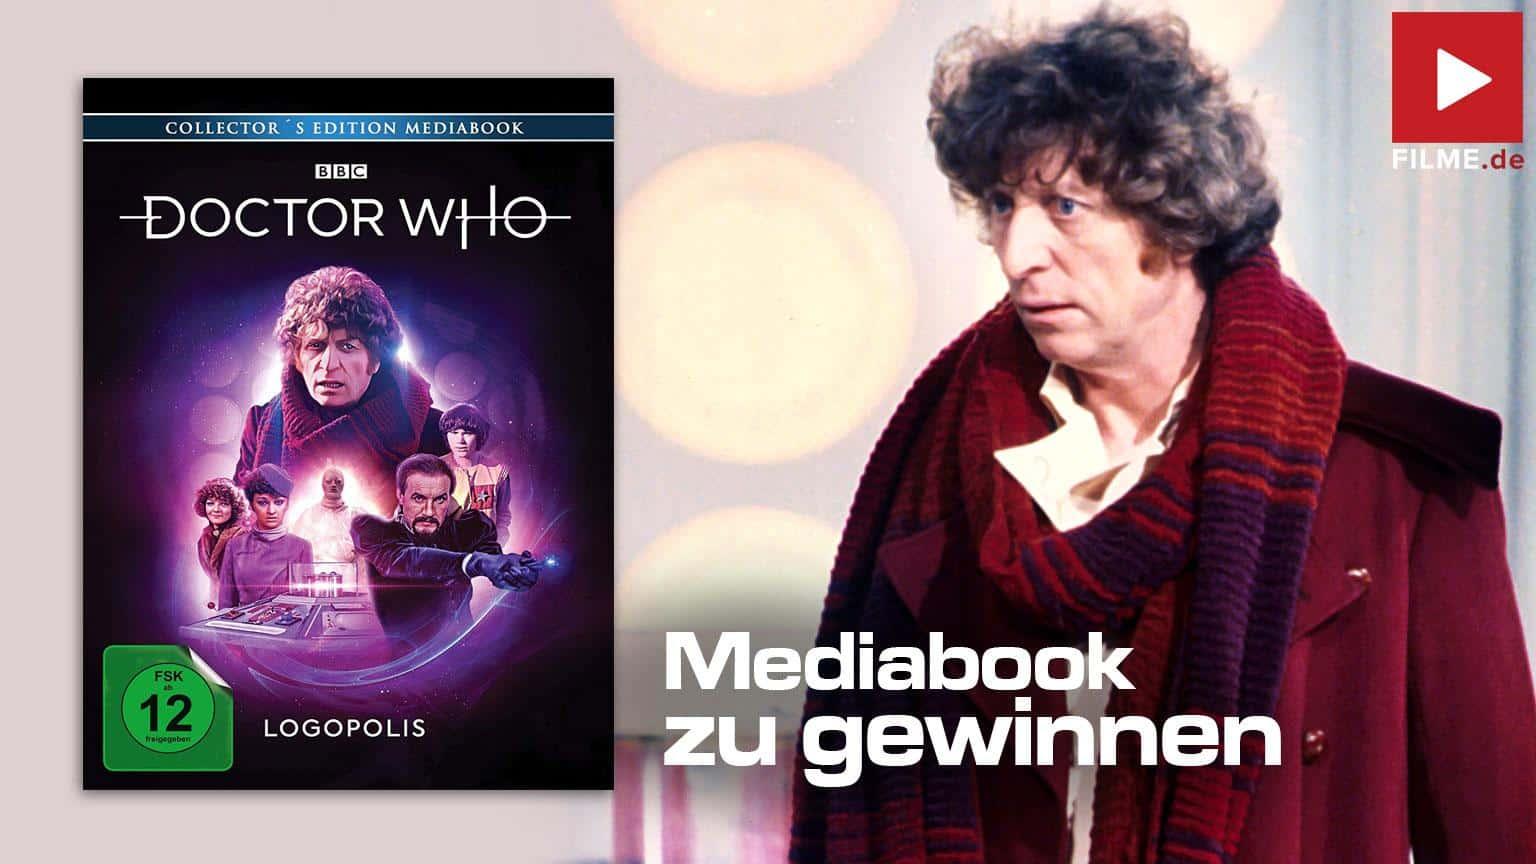 Doctor Who vierter Doktor Logopolis Gewinnspiel Artikelbild